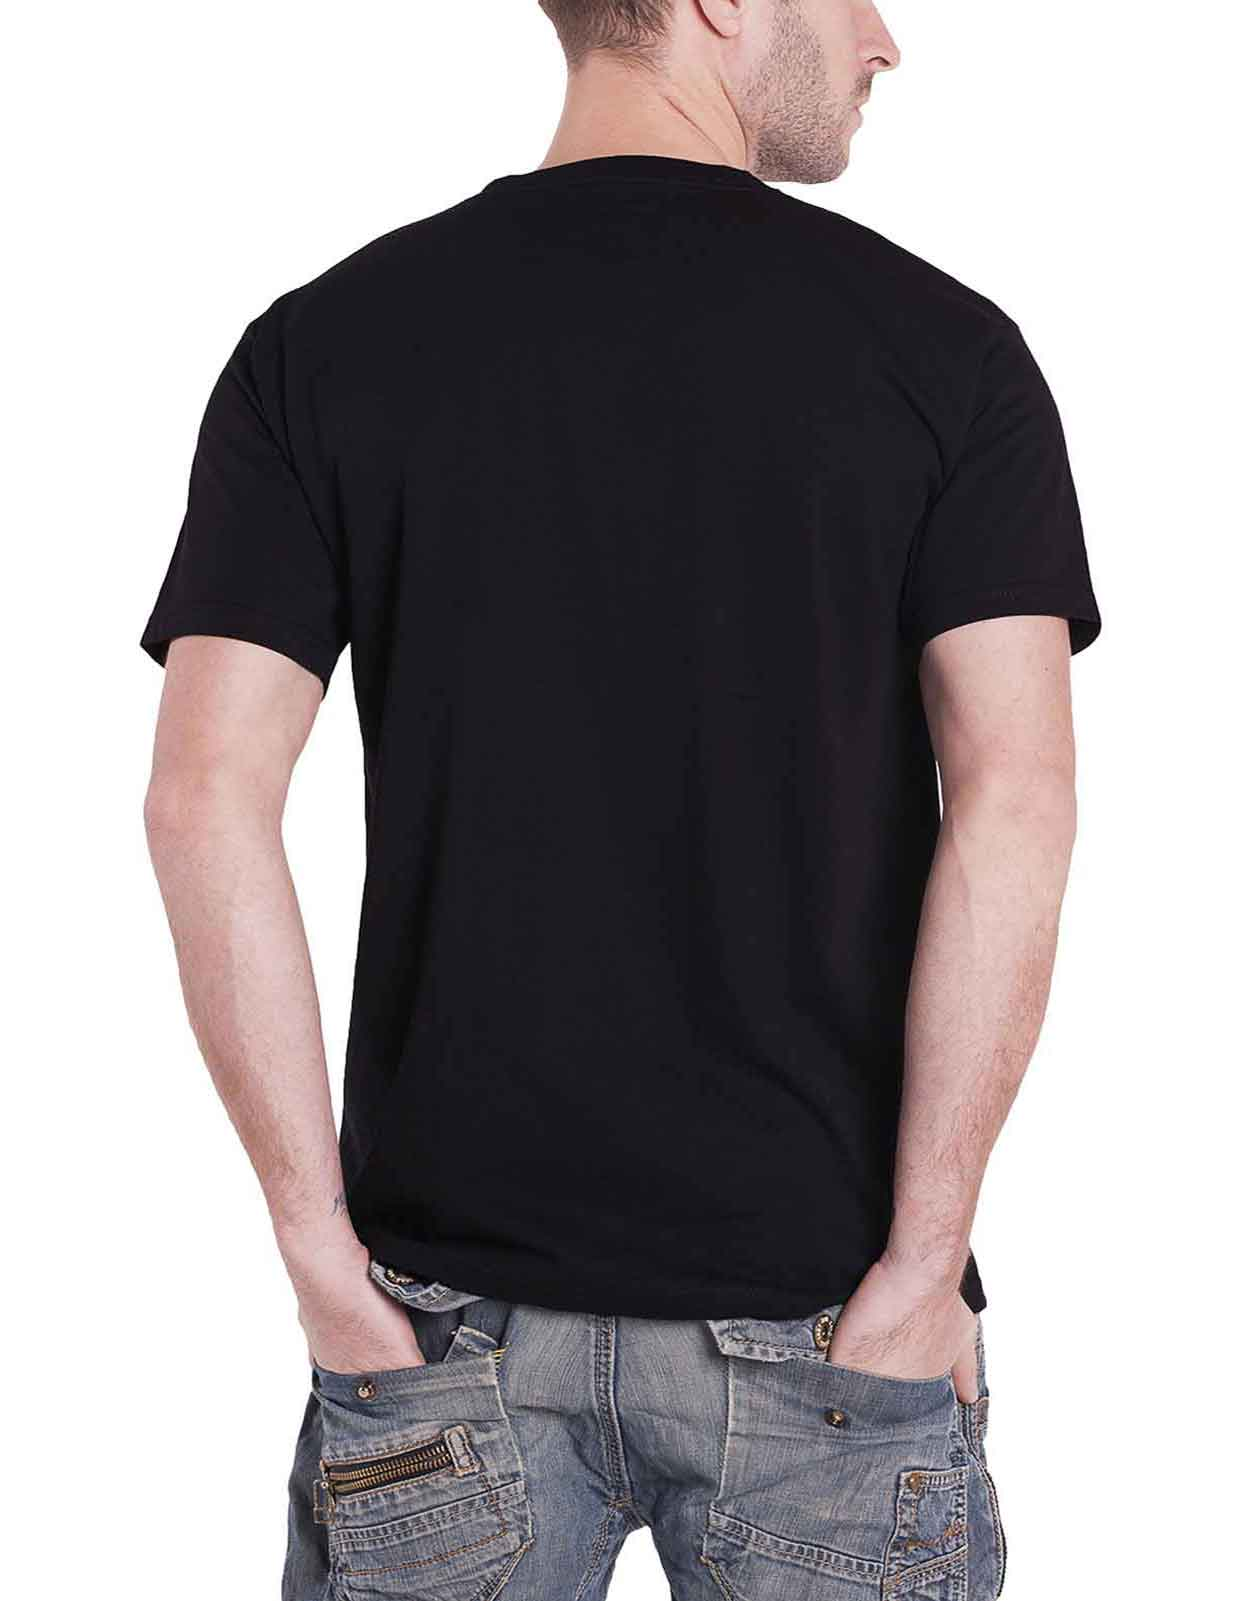 Motorhead-T-Shirt-Lemmy-RIP-England-warpig-clean-your-clock-official-new-mens Indexbild 13